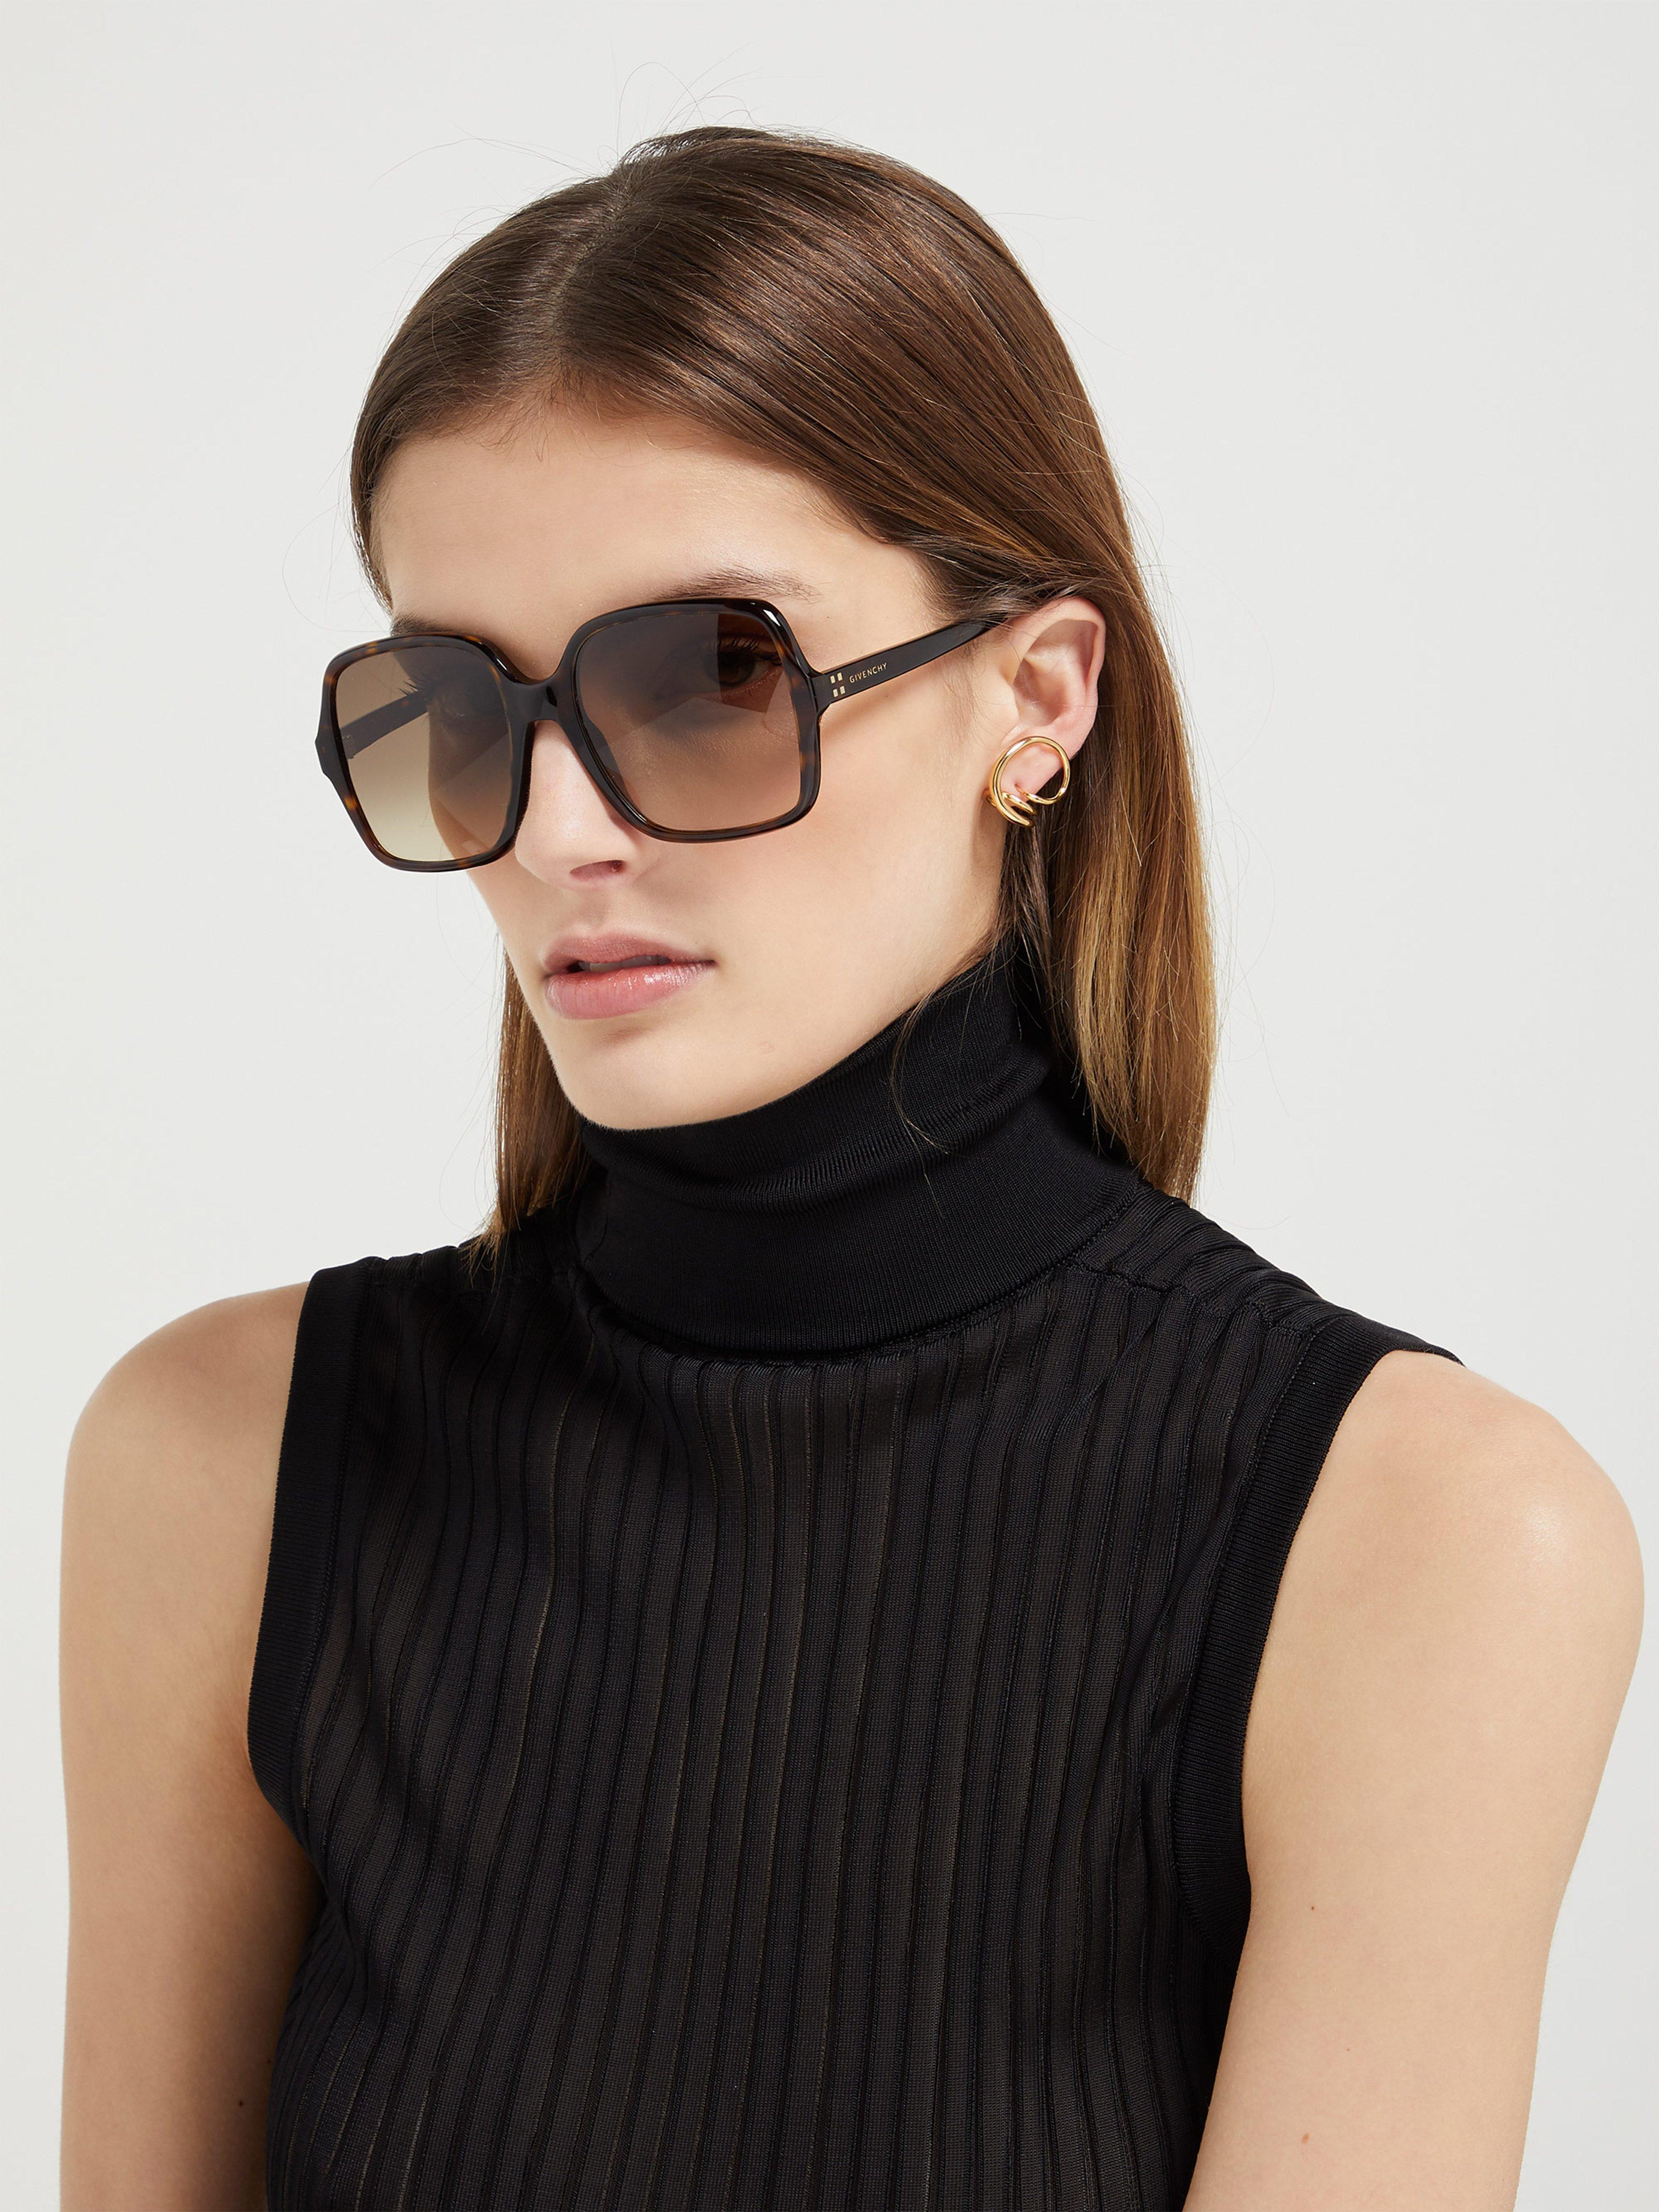 Square Frame Sunglasses Givenchy Multicolor Oversized Acetate ZiXOkuPT